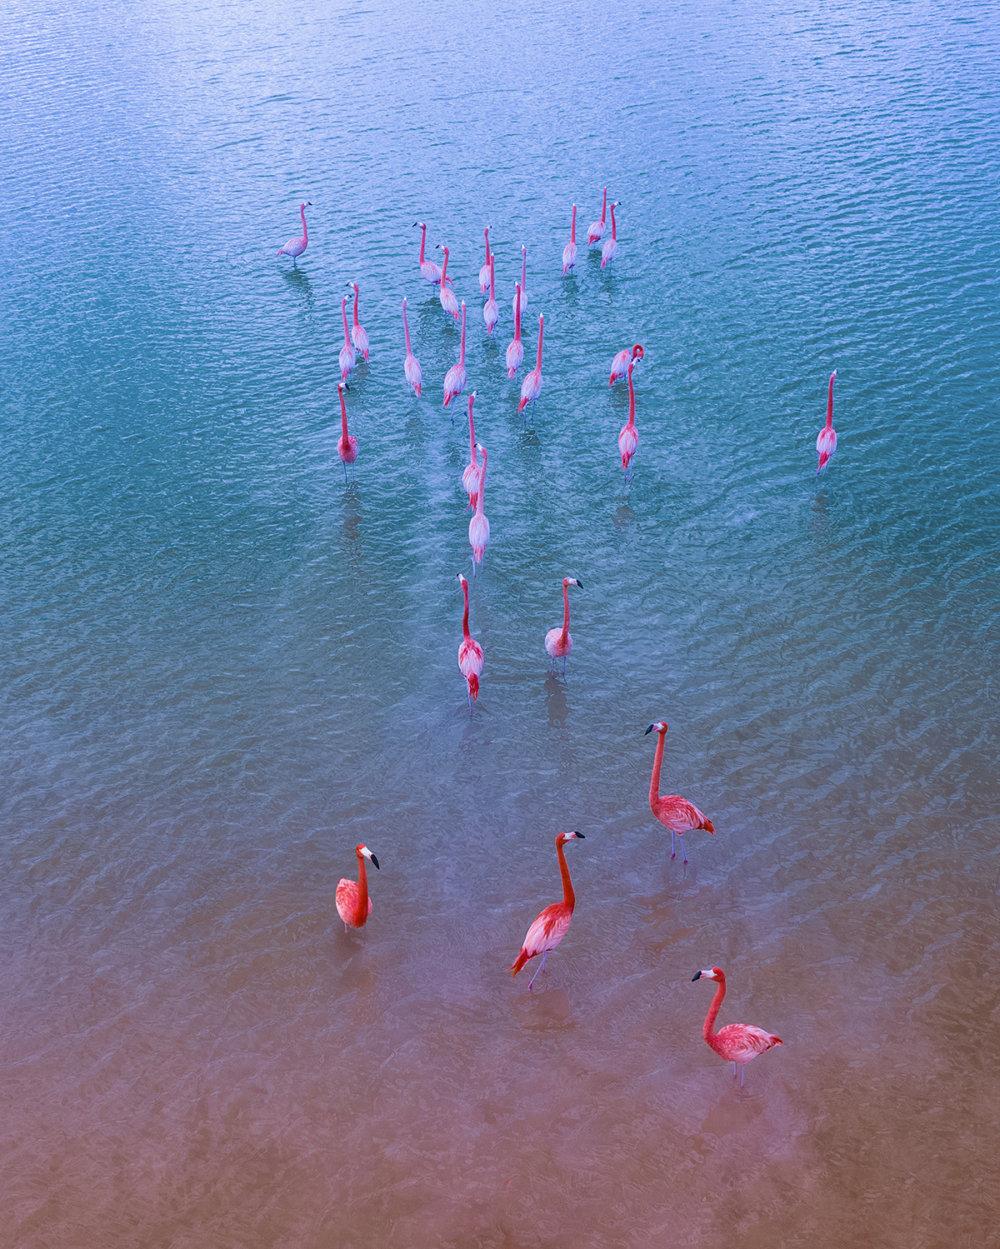 Mexico From Above Aerial Photography Series By Dimitar Karanikolov 7